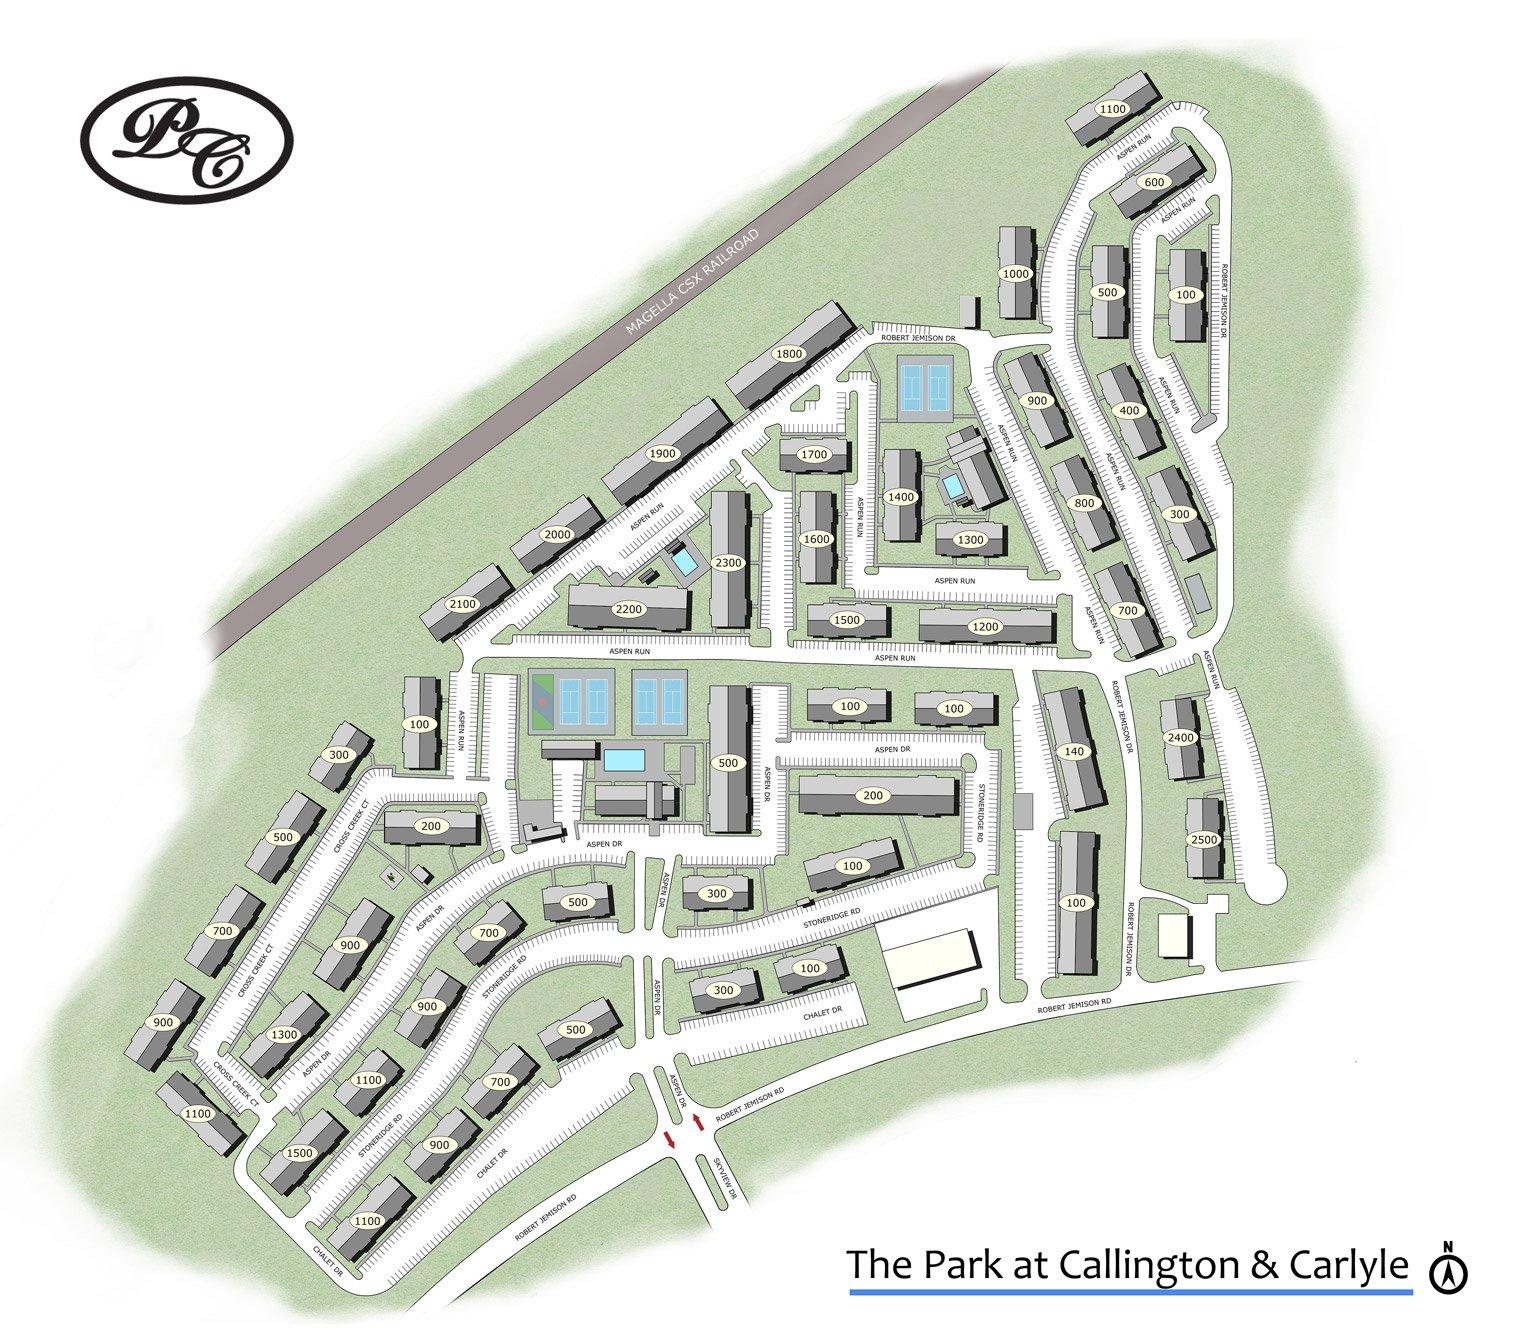 The Park at Callington & Carlyle -